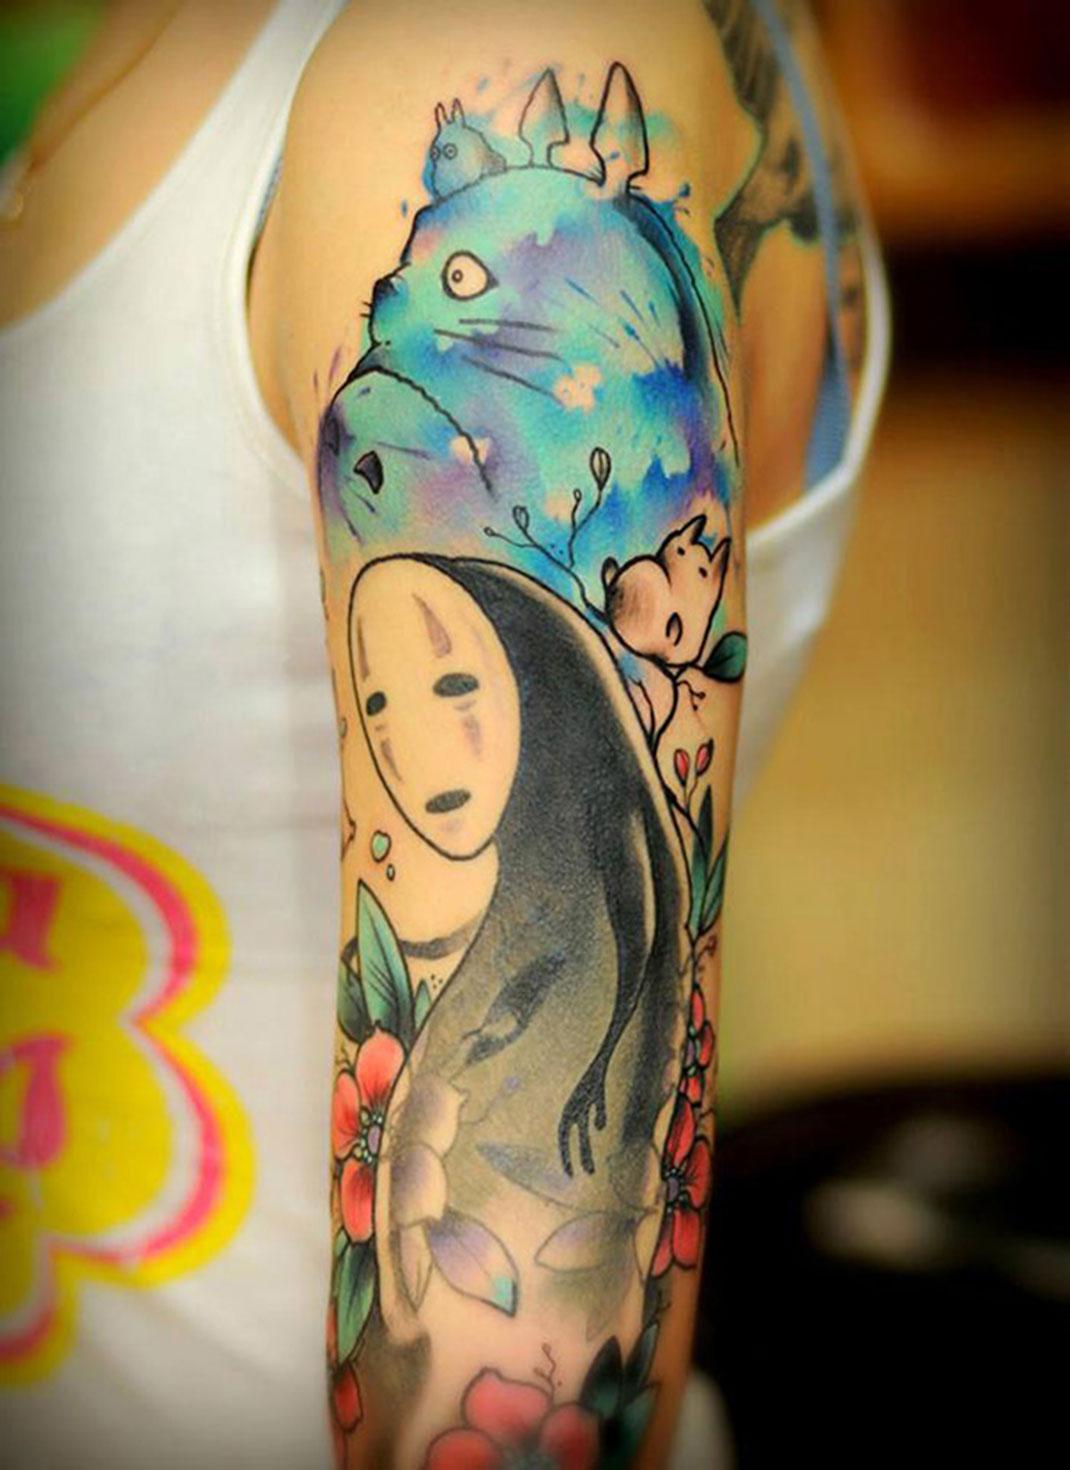 20 superbes tatouages qui rendent hommage aux chefs d uvre de hayao miyazaki daily geek show. Black Bedroom Furniture Sets. Home Design Ideas